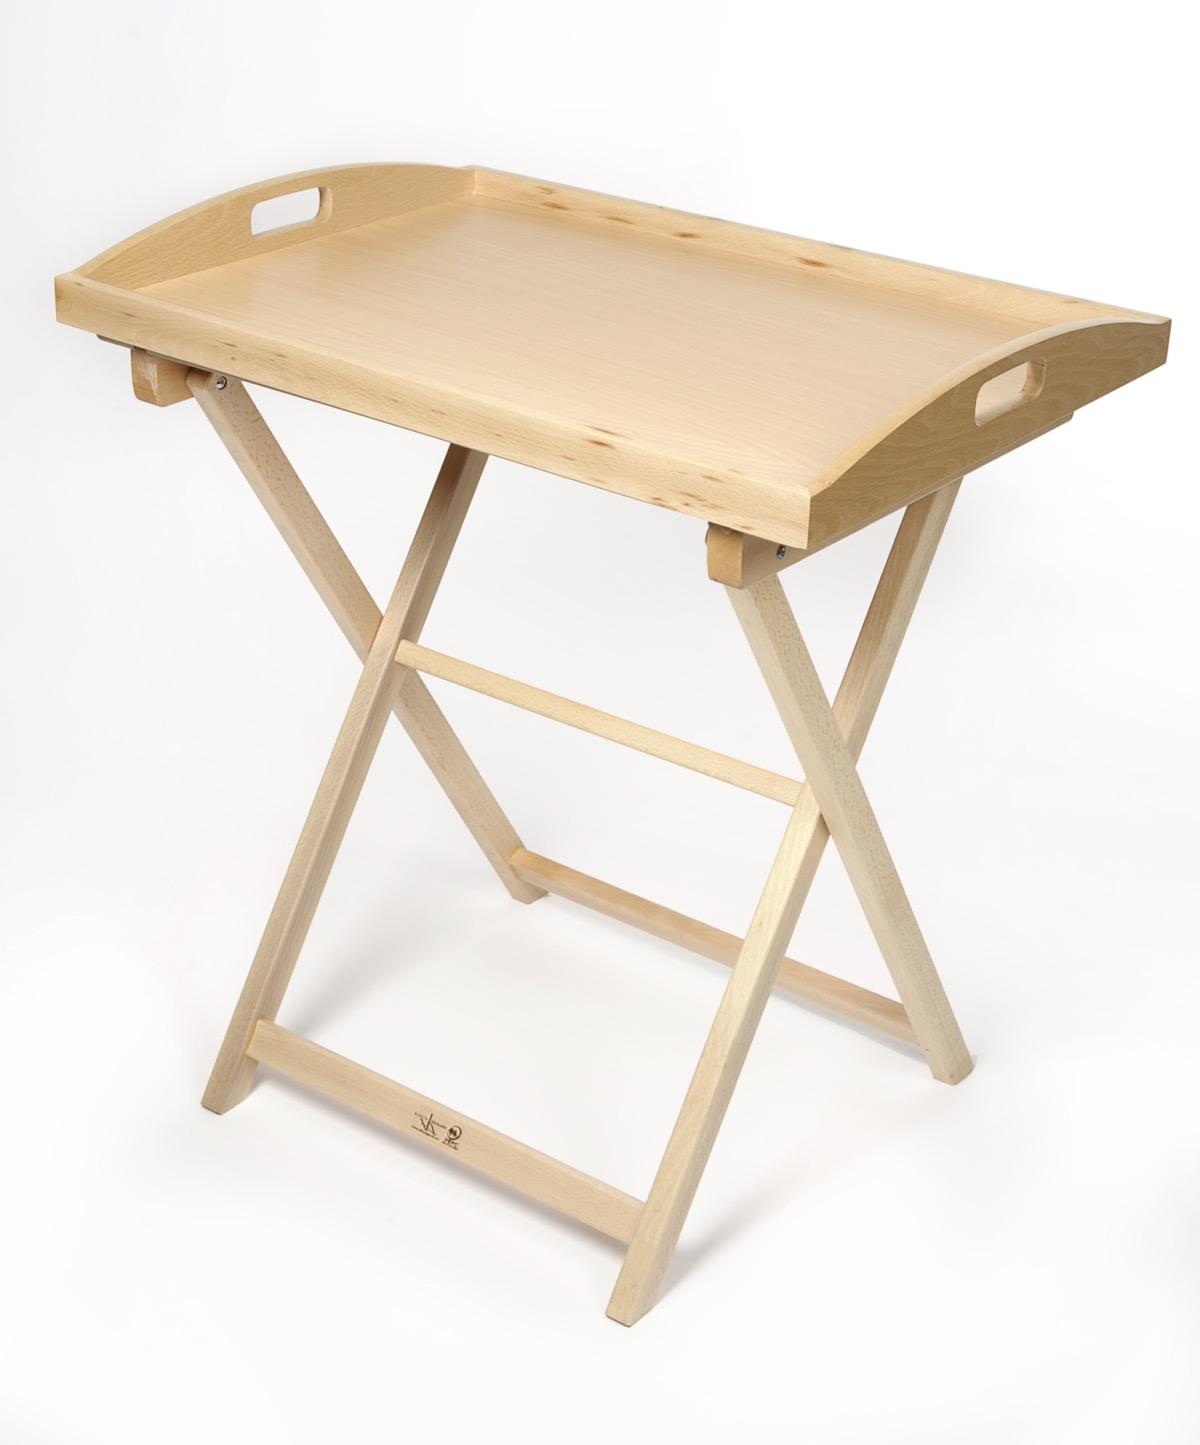 table pliante avec plateau en bois - garcía hnos.